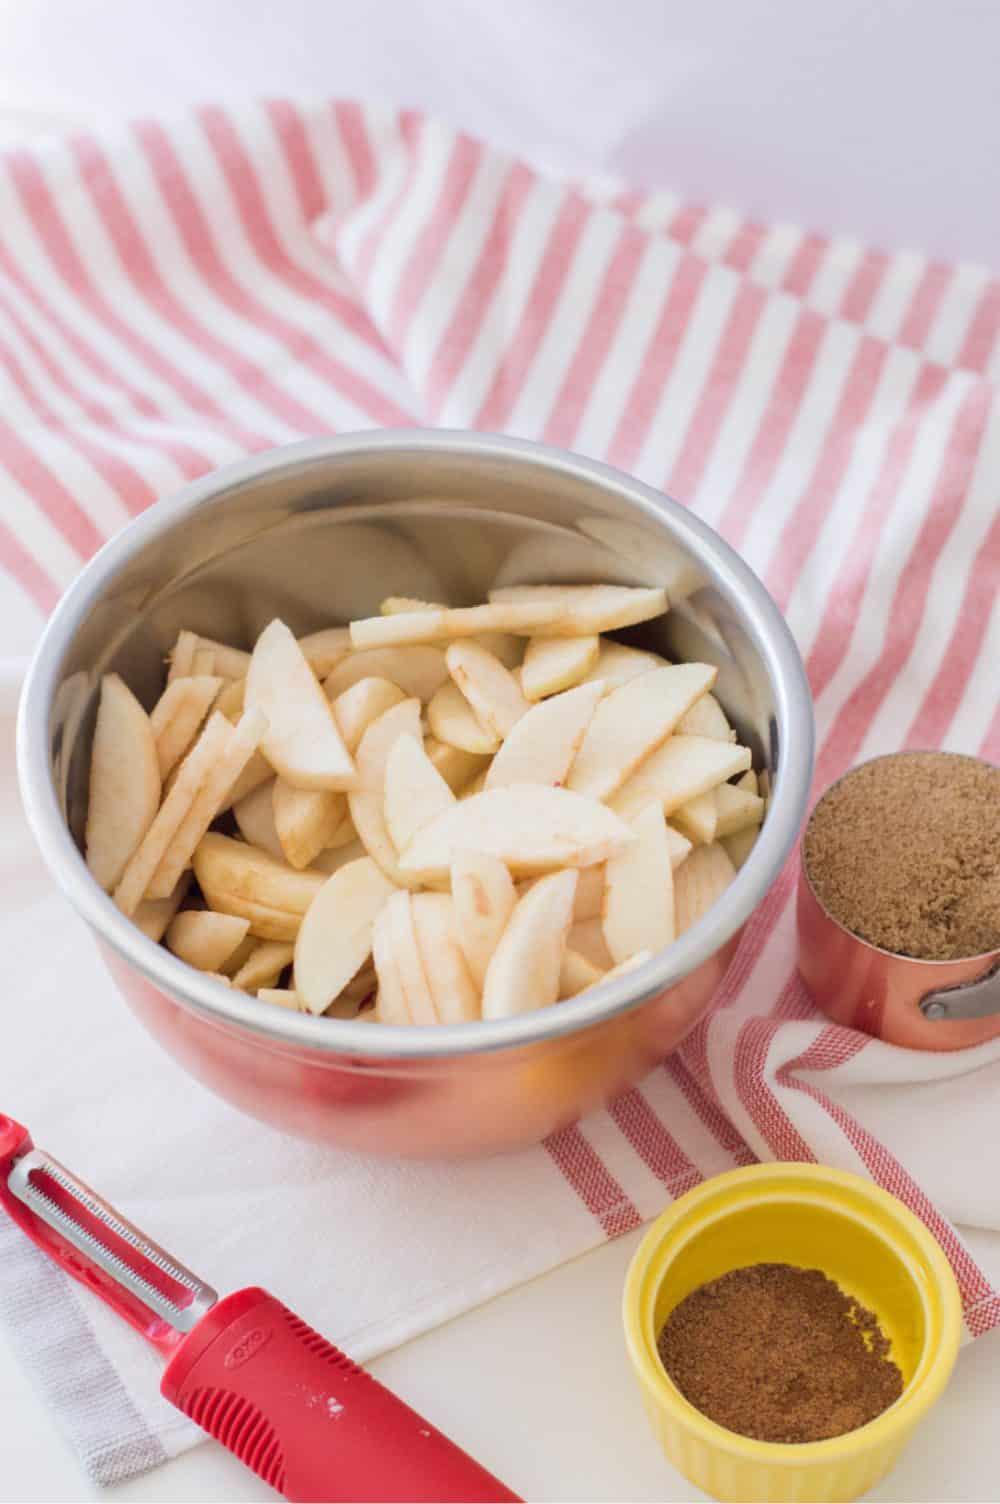 tossing apples with sugar, cinnamon, nutmeg for apple cobbler filling